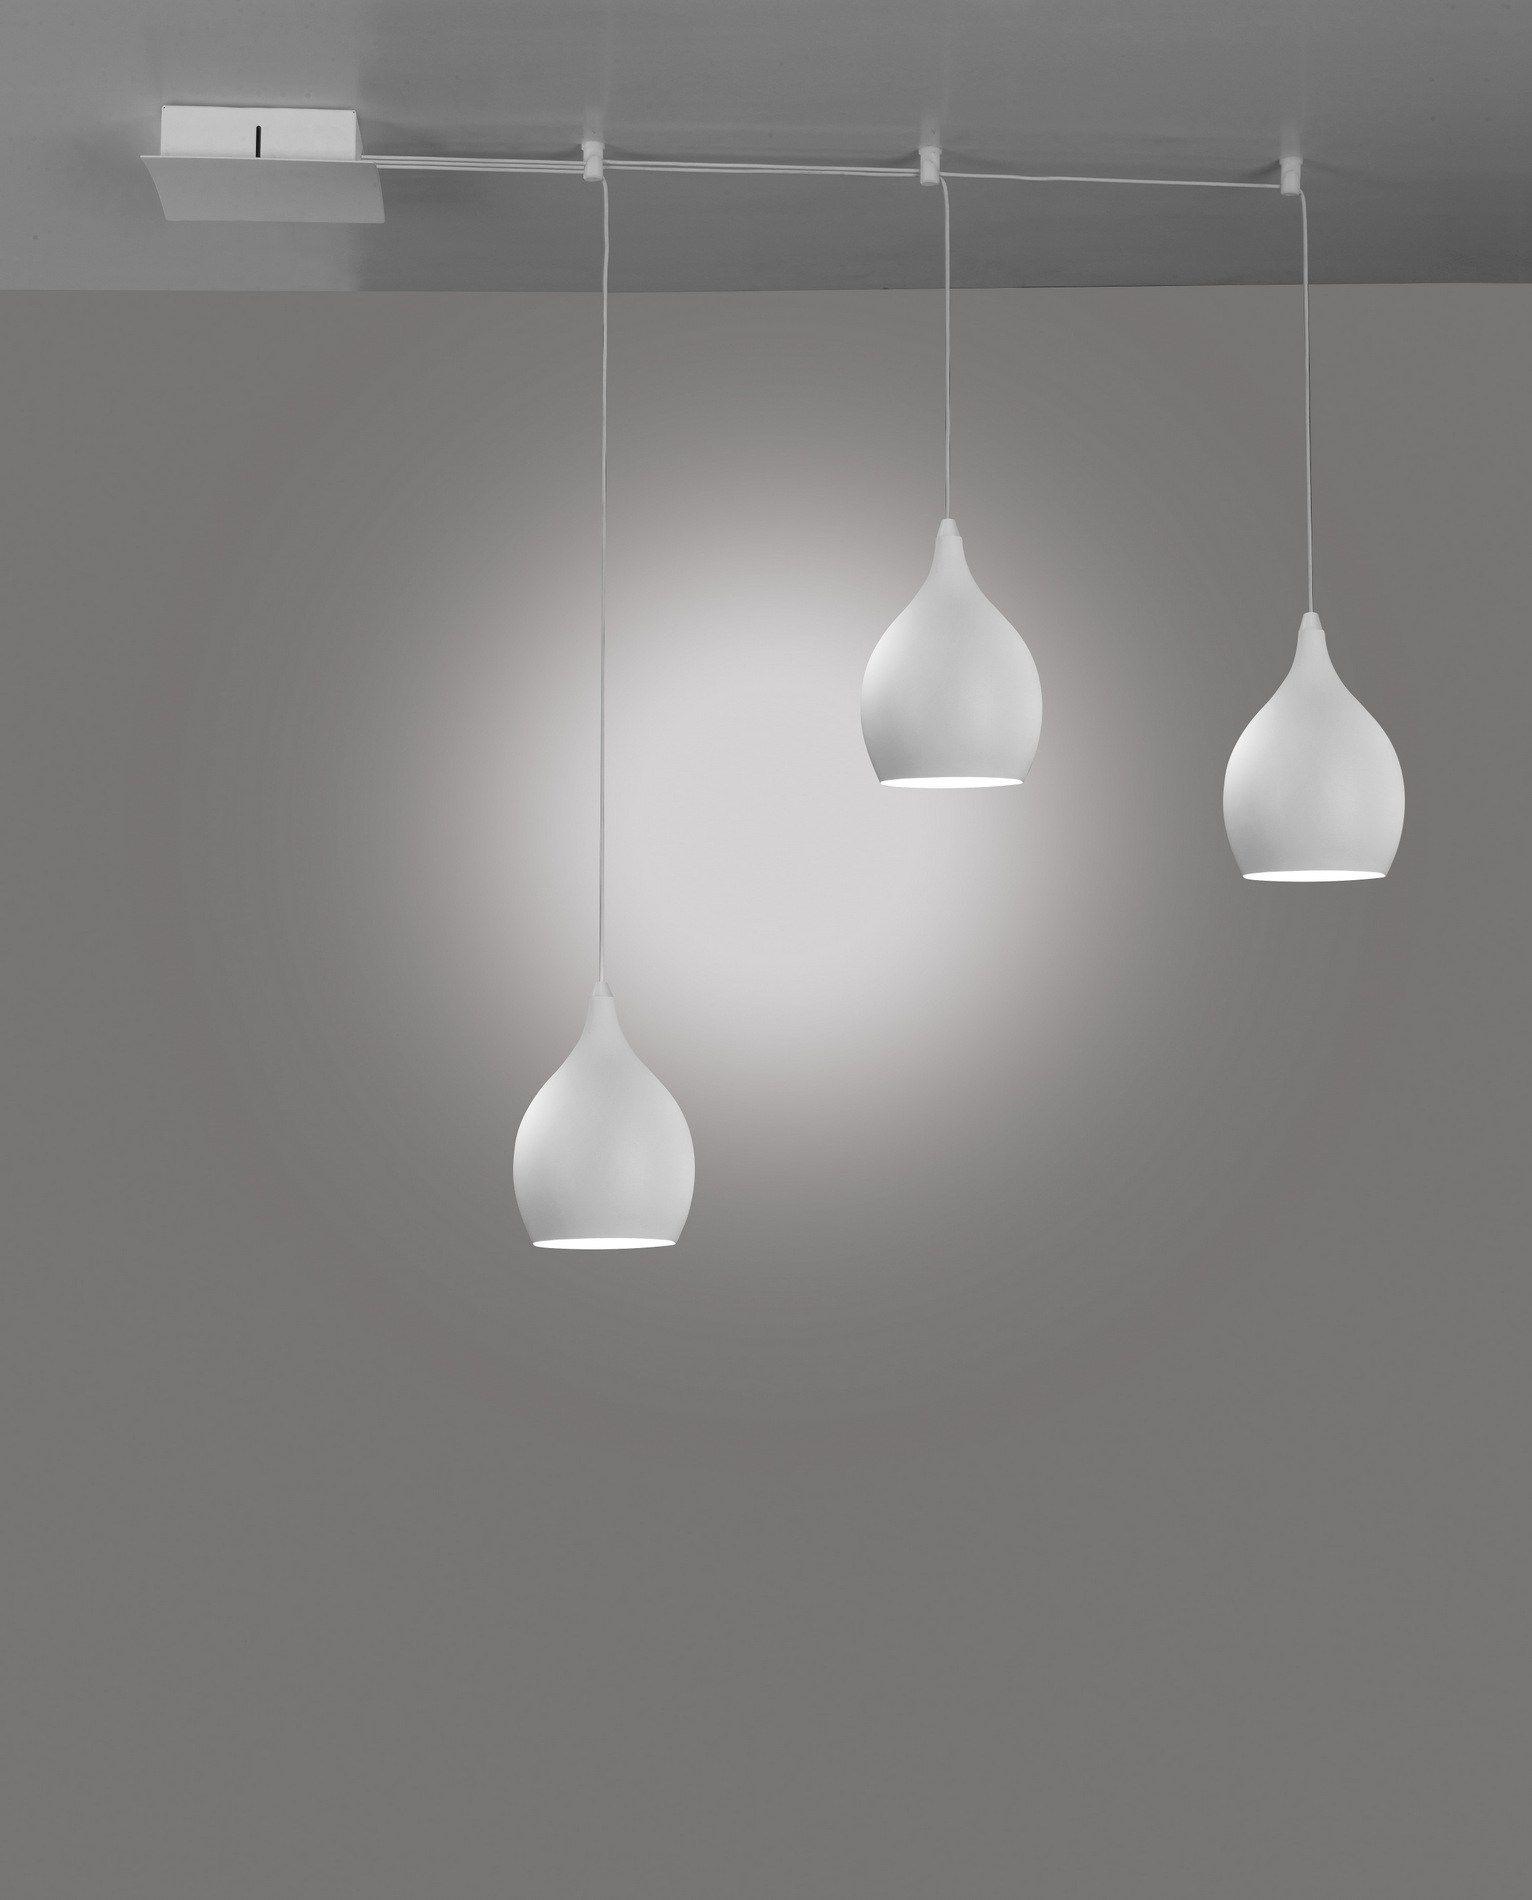 Lampada a sospensione a led drop by cattaneo illuminazione - Lampada sospensione design ...